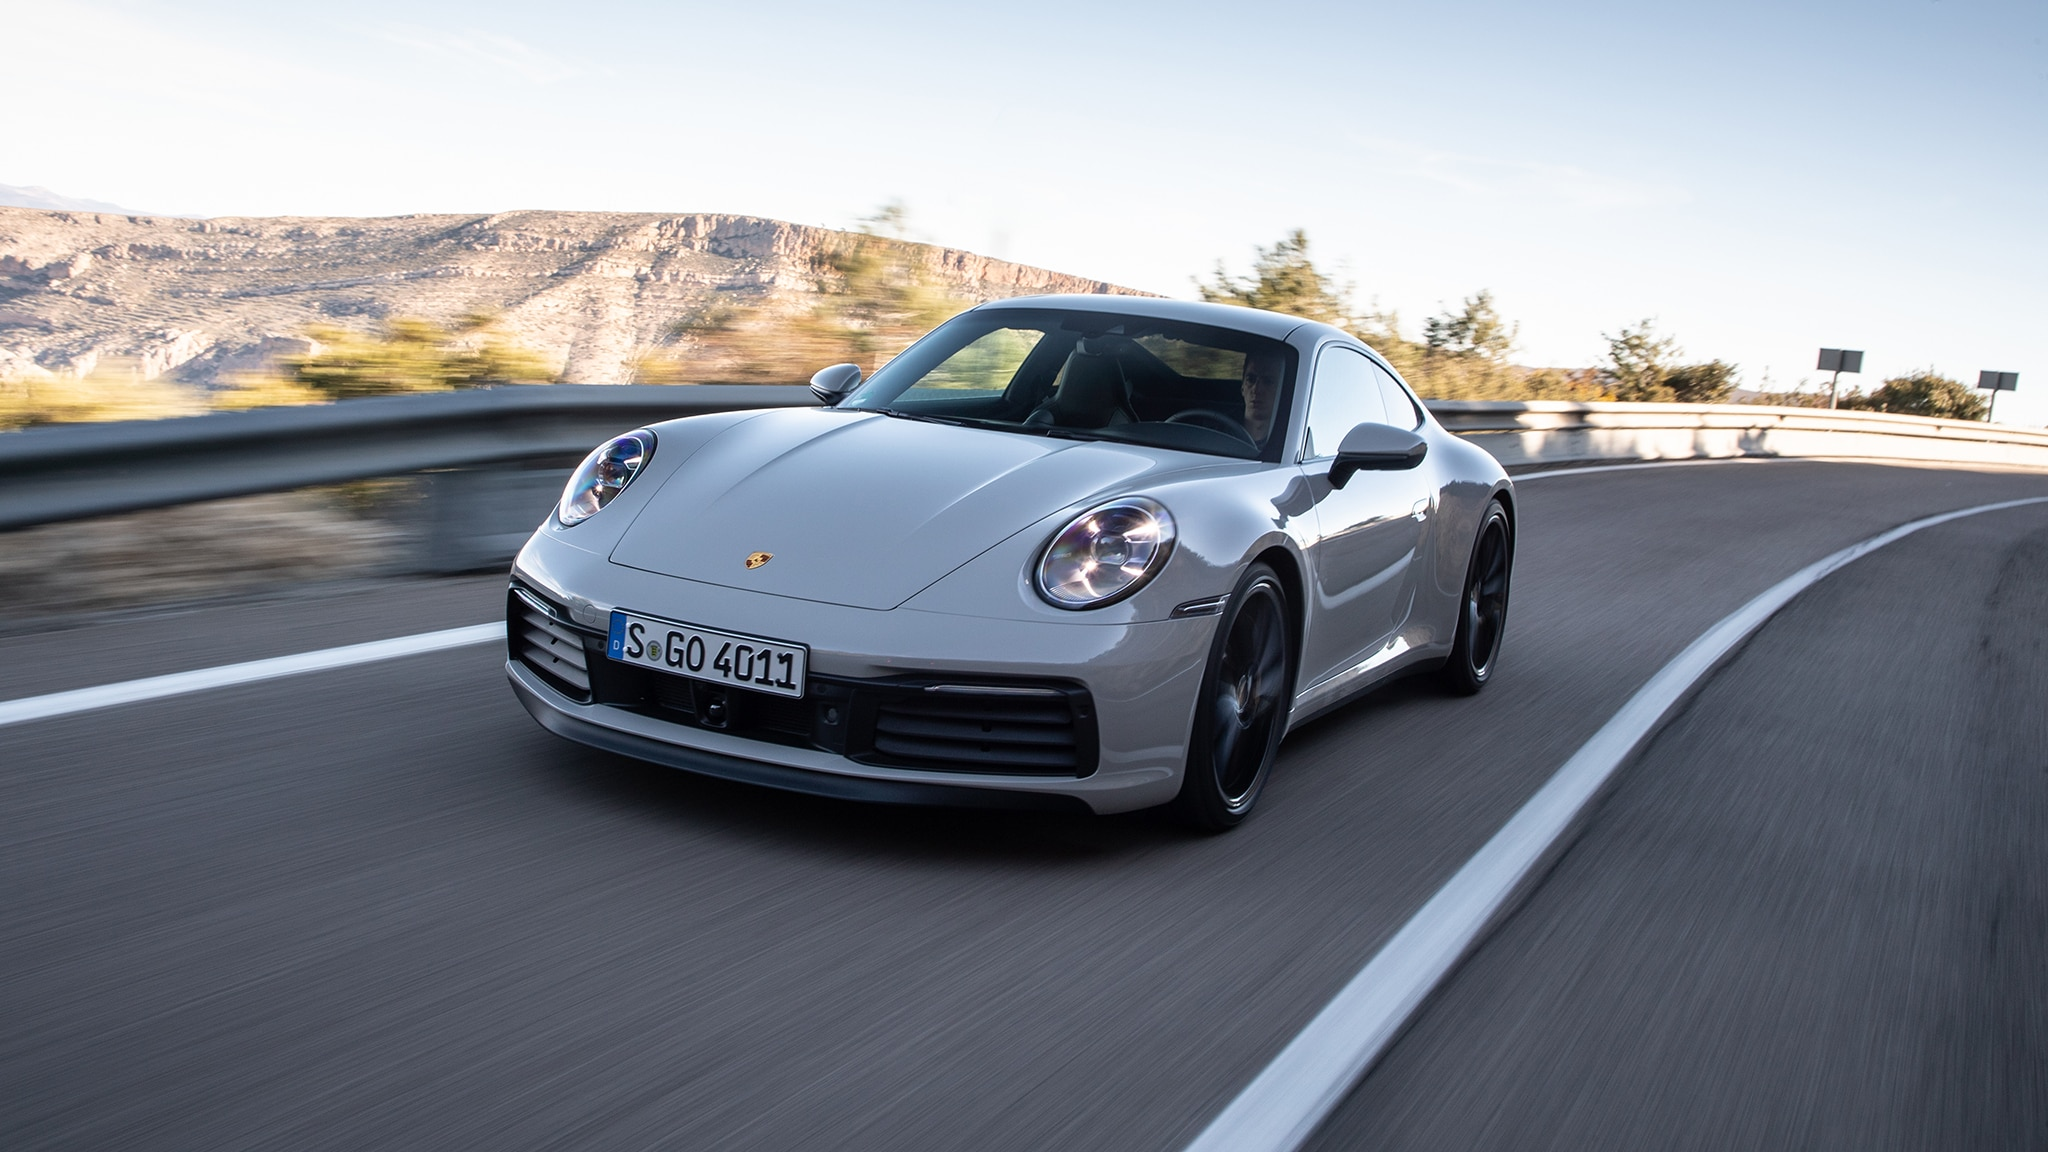 2020 Porsche 911 Carrera S First Drive Review It S